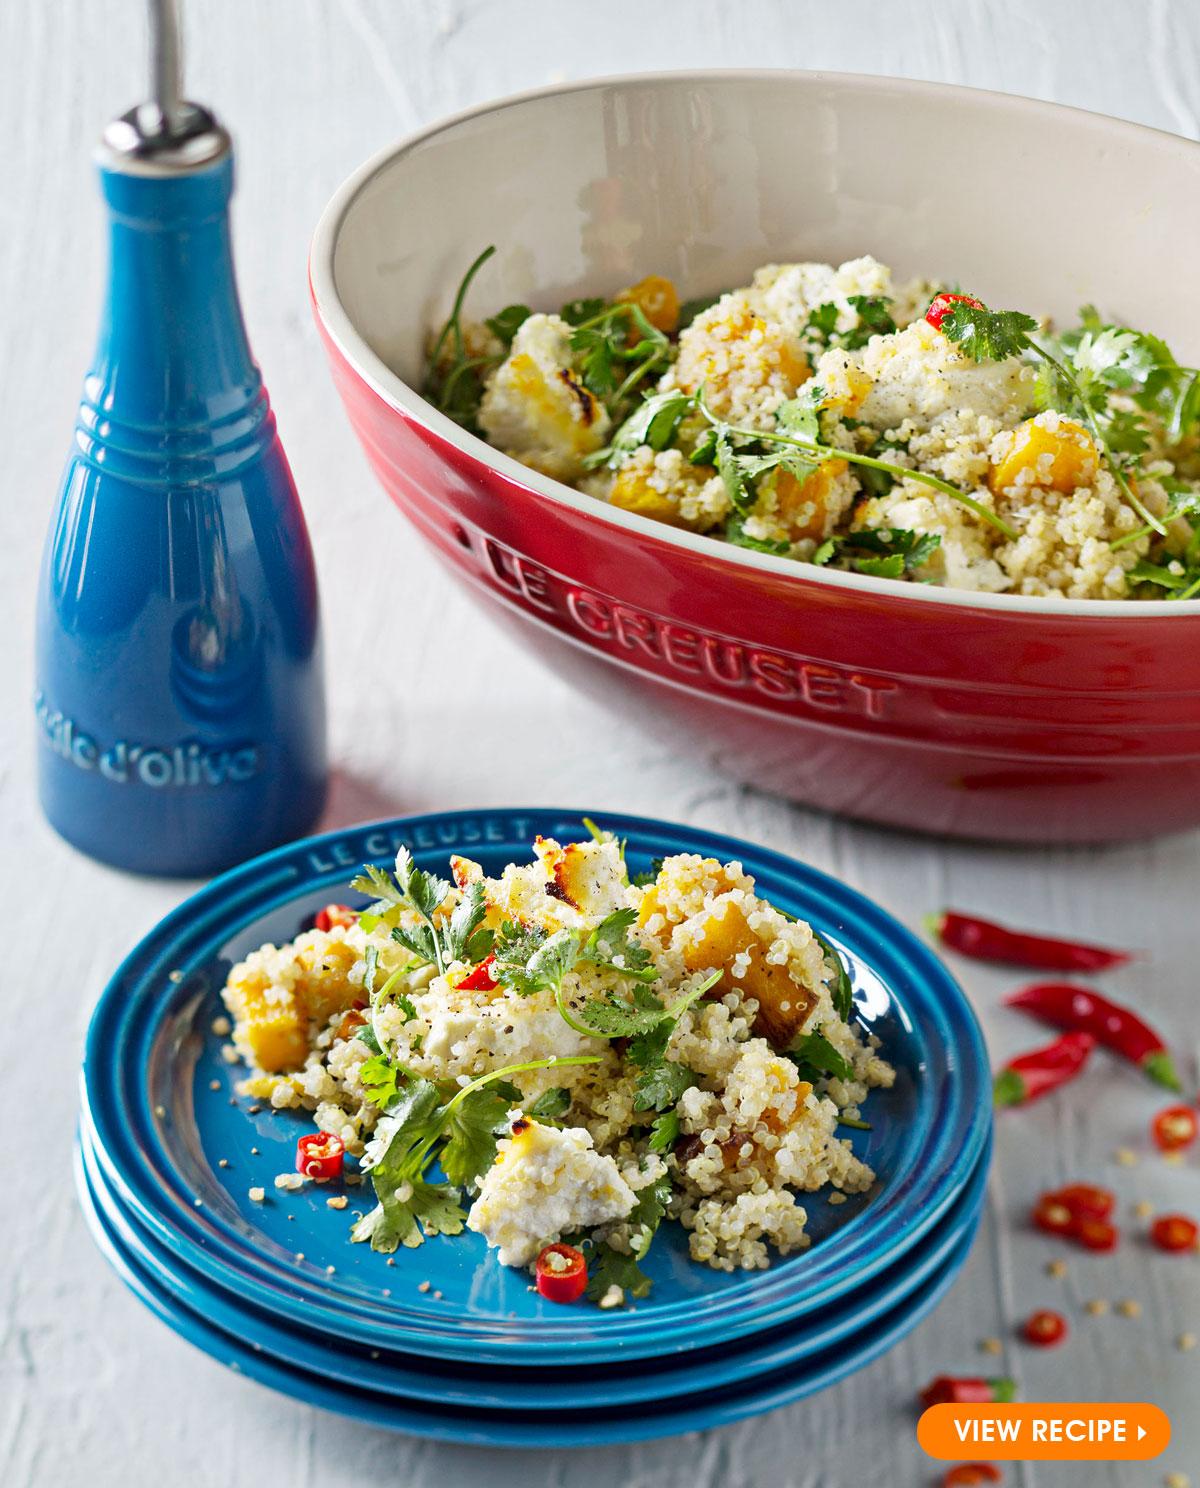 Pumpkin and baked ricotta quinoa salad